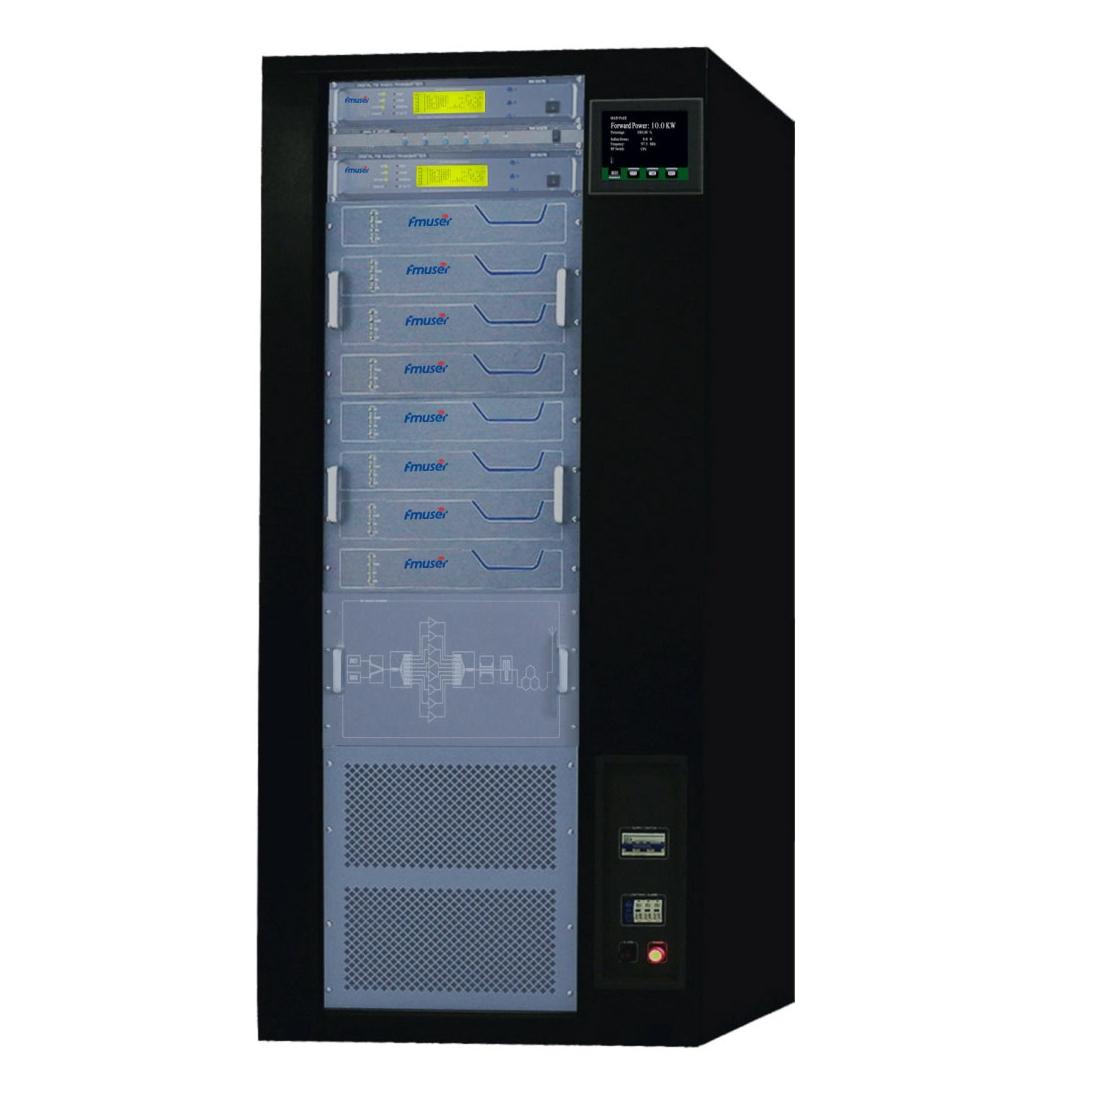 CZH618F-10KW पेशेवर एफएम ट्रांसमीटर 10000w रेडियो प्रसारण एफएम ट्रांसमीटर उत्तेजक